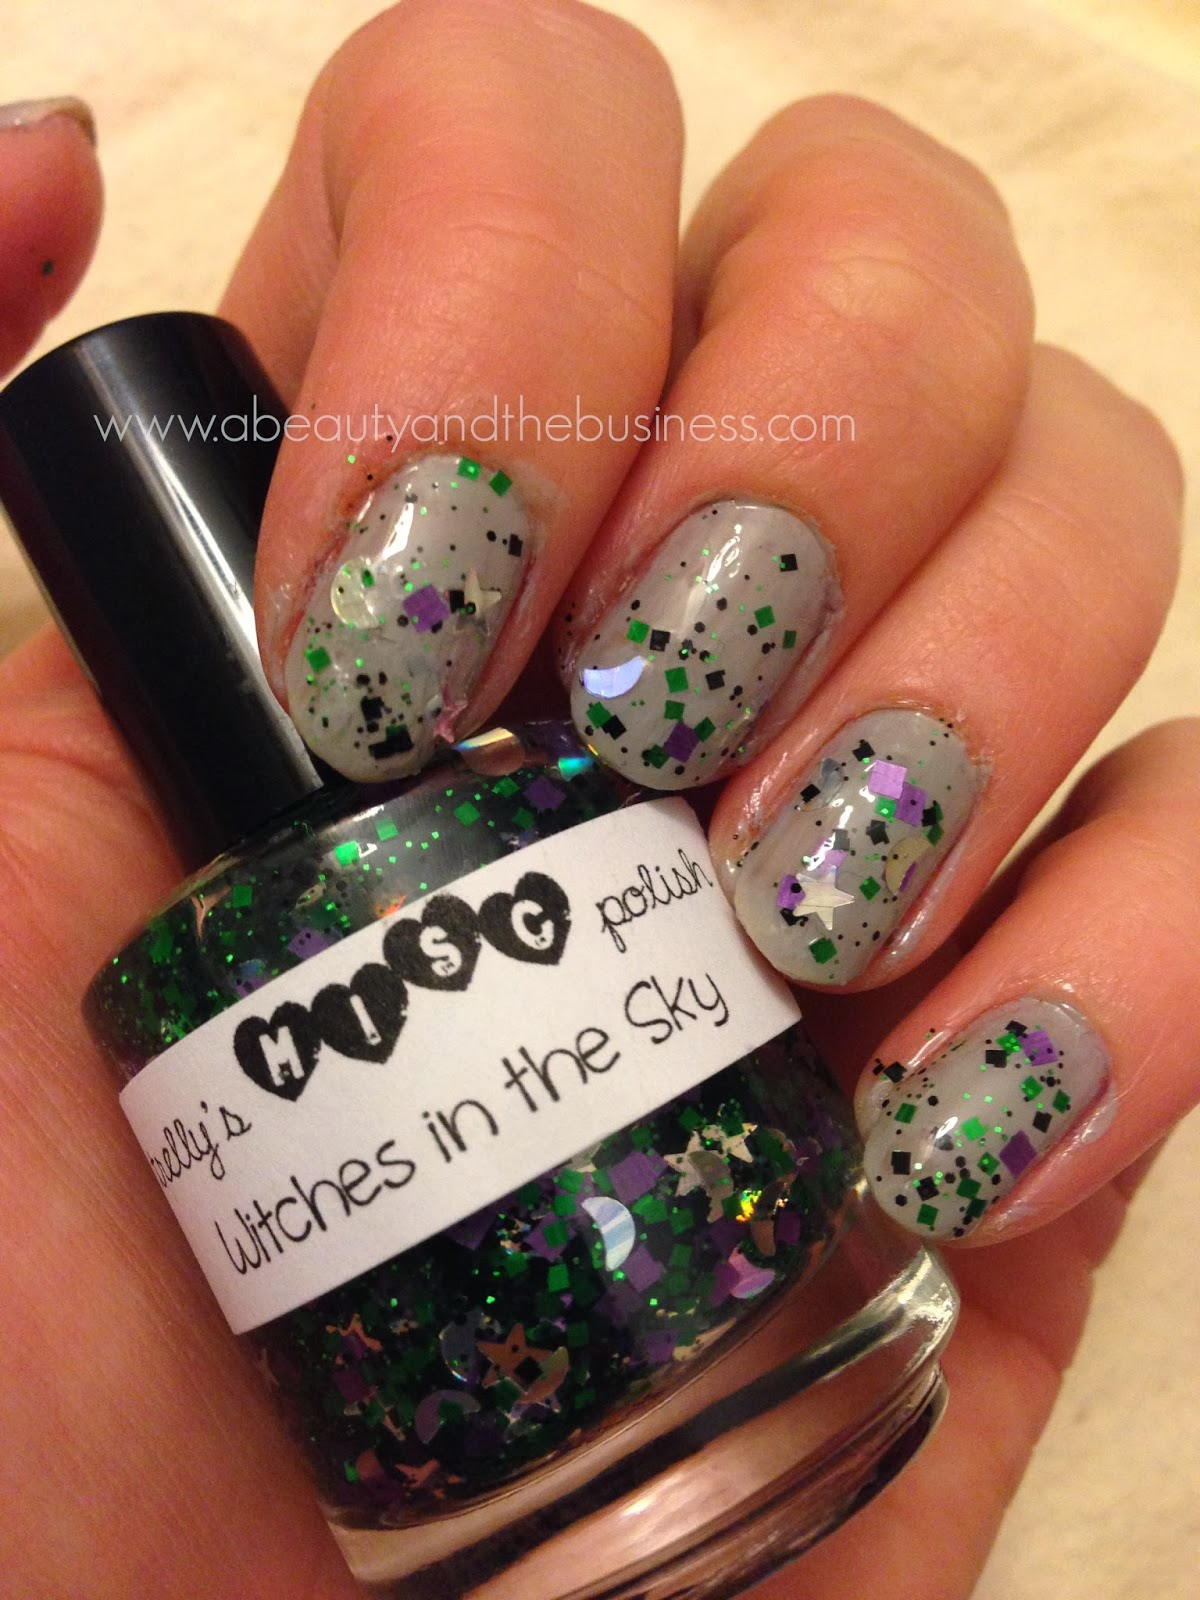 Holiday nails, holiday nails halloween edition, halloween nails, halloween nail art, halloween skittle nails, skittle nails, nail art, manicure, trelly polish, trelly, trelly witches in the sky, pumplin nail art, glitter polish.